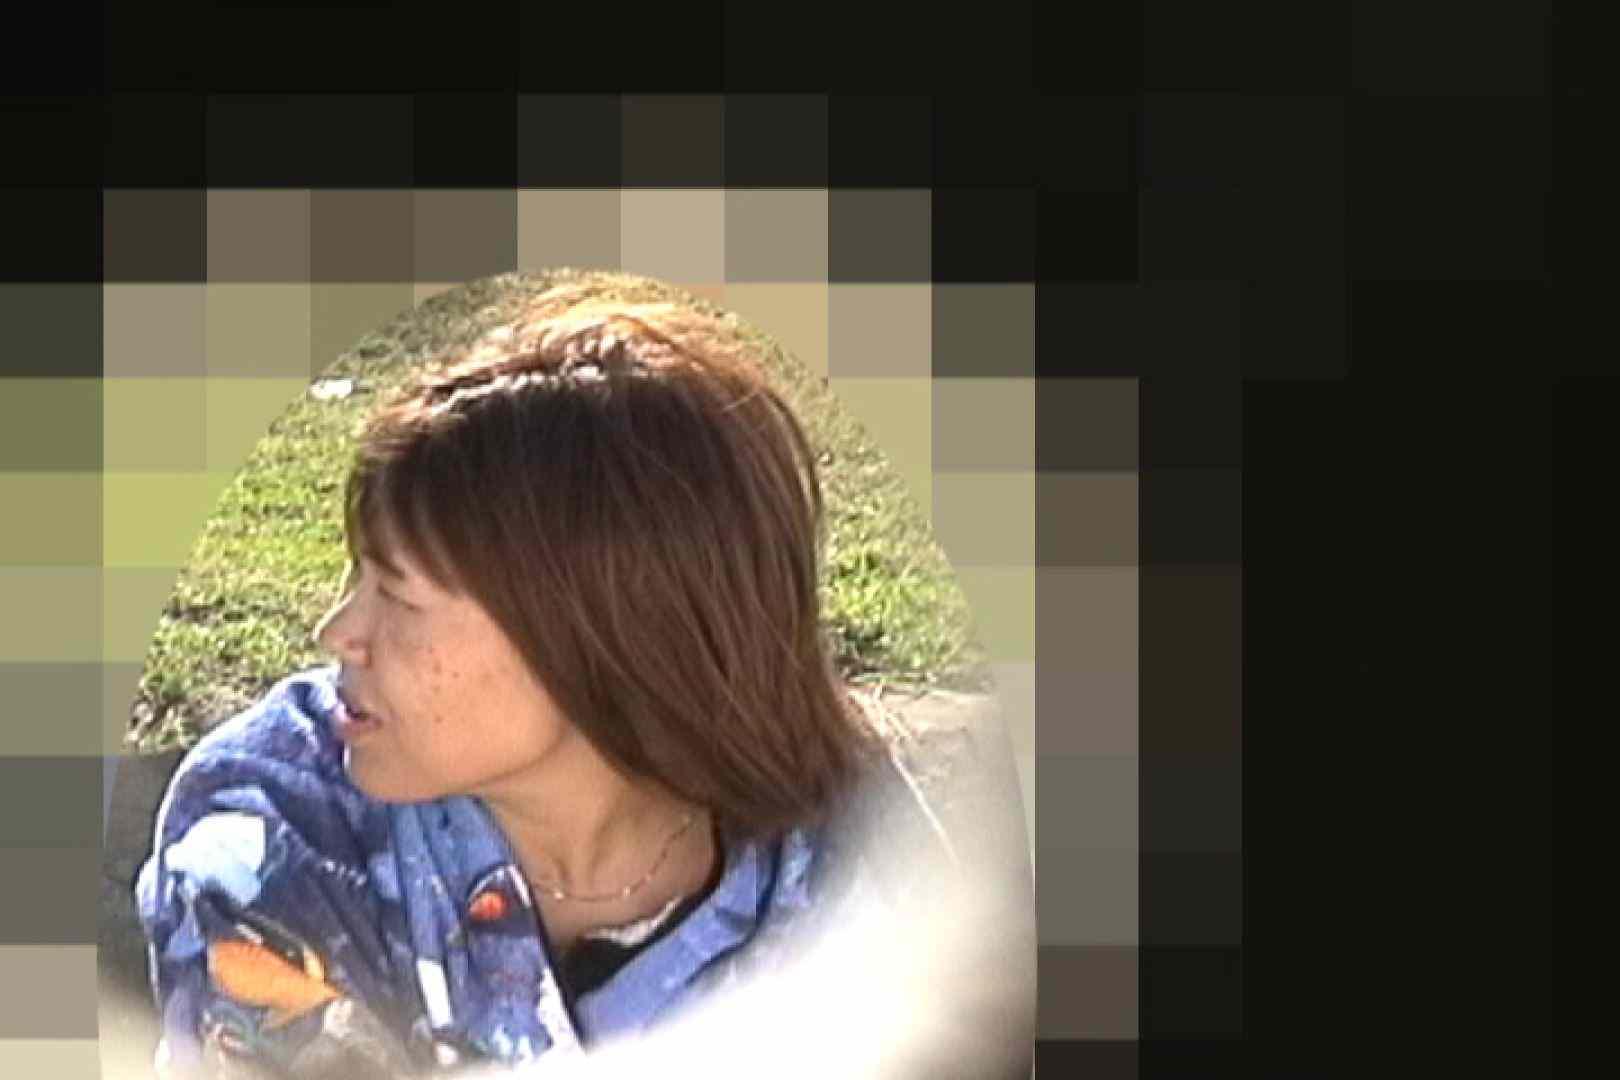 No.88 張りのある見事な巨乳のゆれ具合を堪能 むっちりガール ワレメ動画紹介 95枚 3